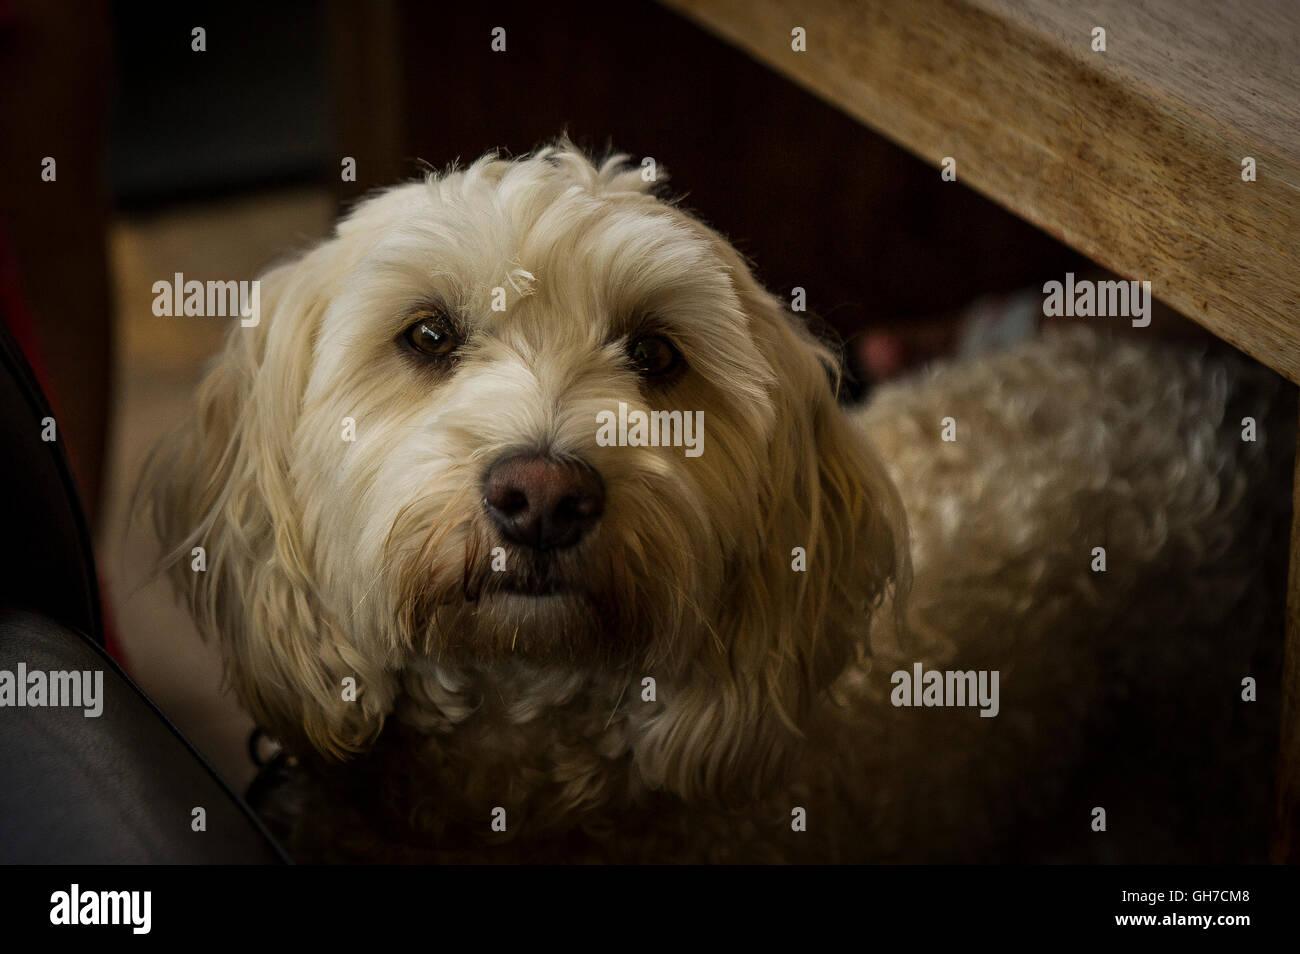 A Cockapoo, a mixed-breed dog. - Stock Image